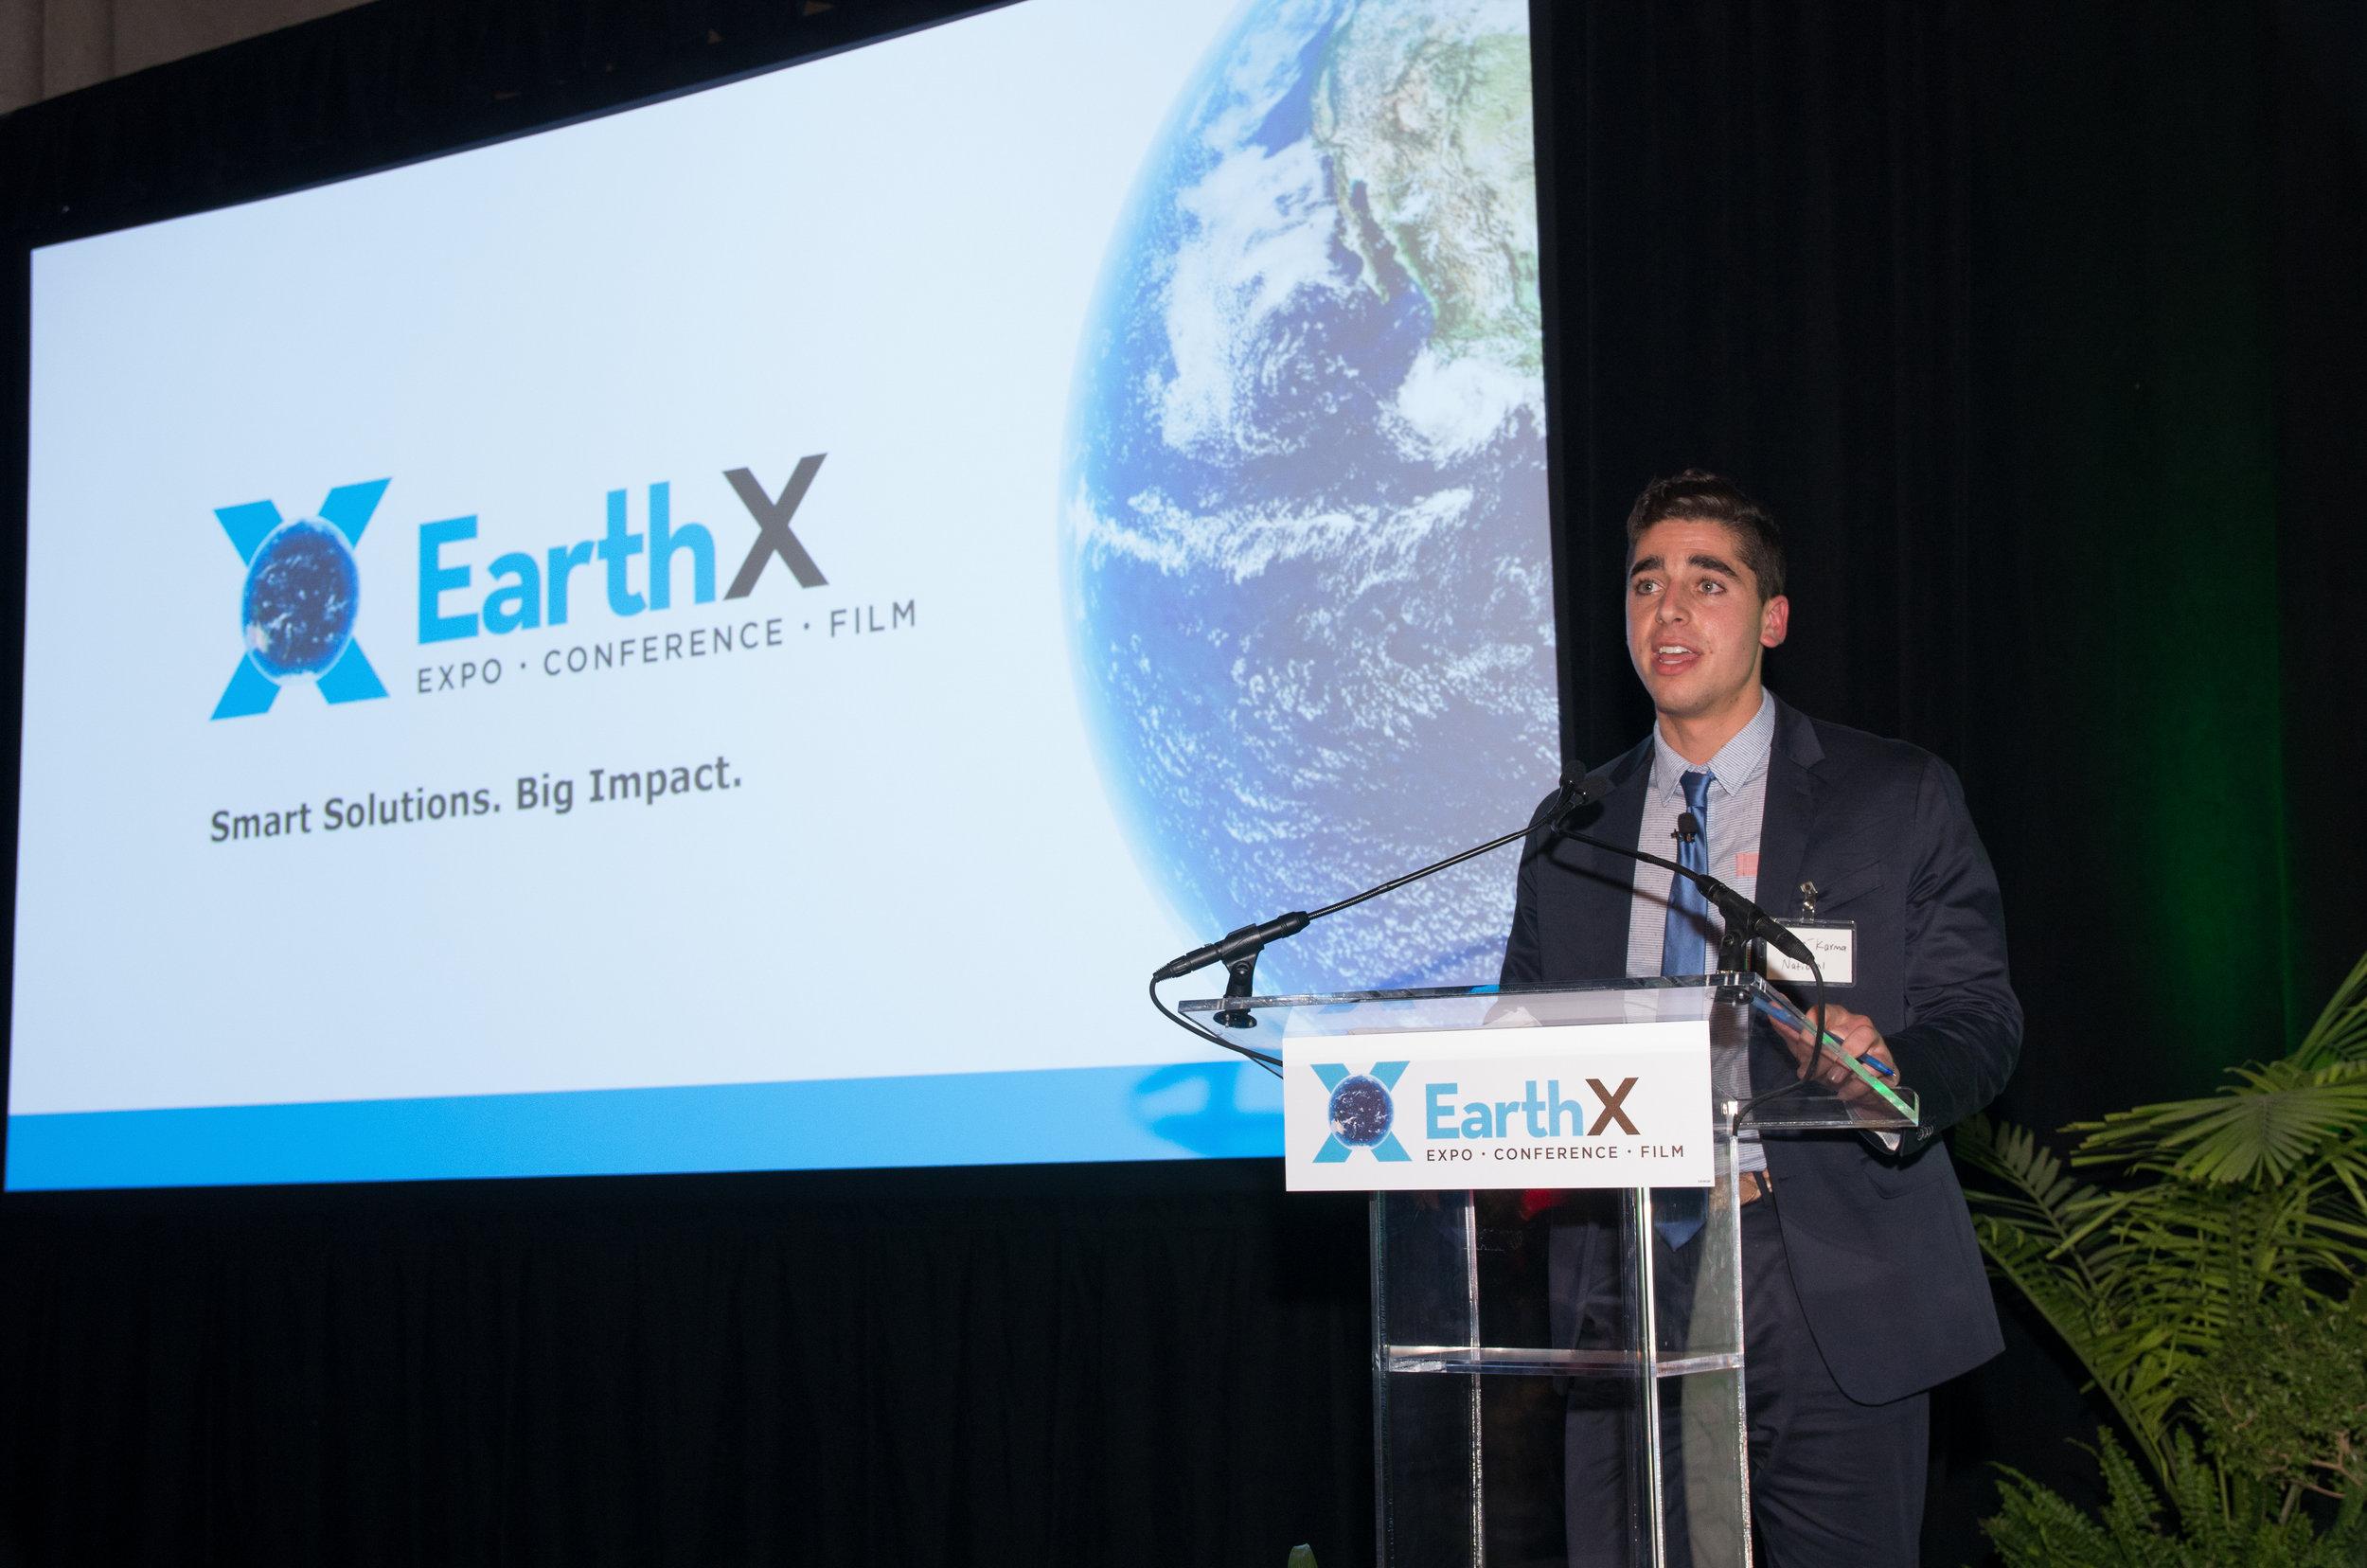 2018-04-21 - EarthX Bridge Summit Conference (SD) 167.jpg